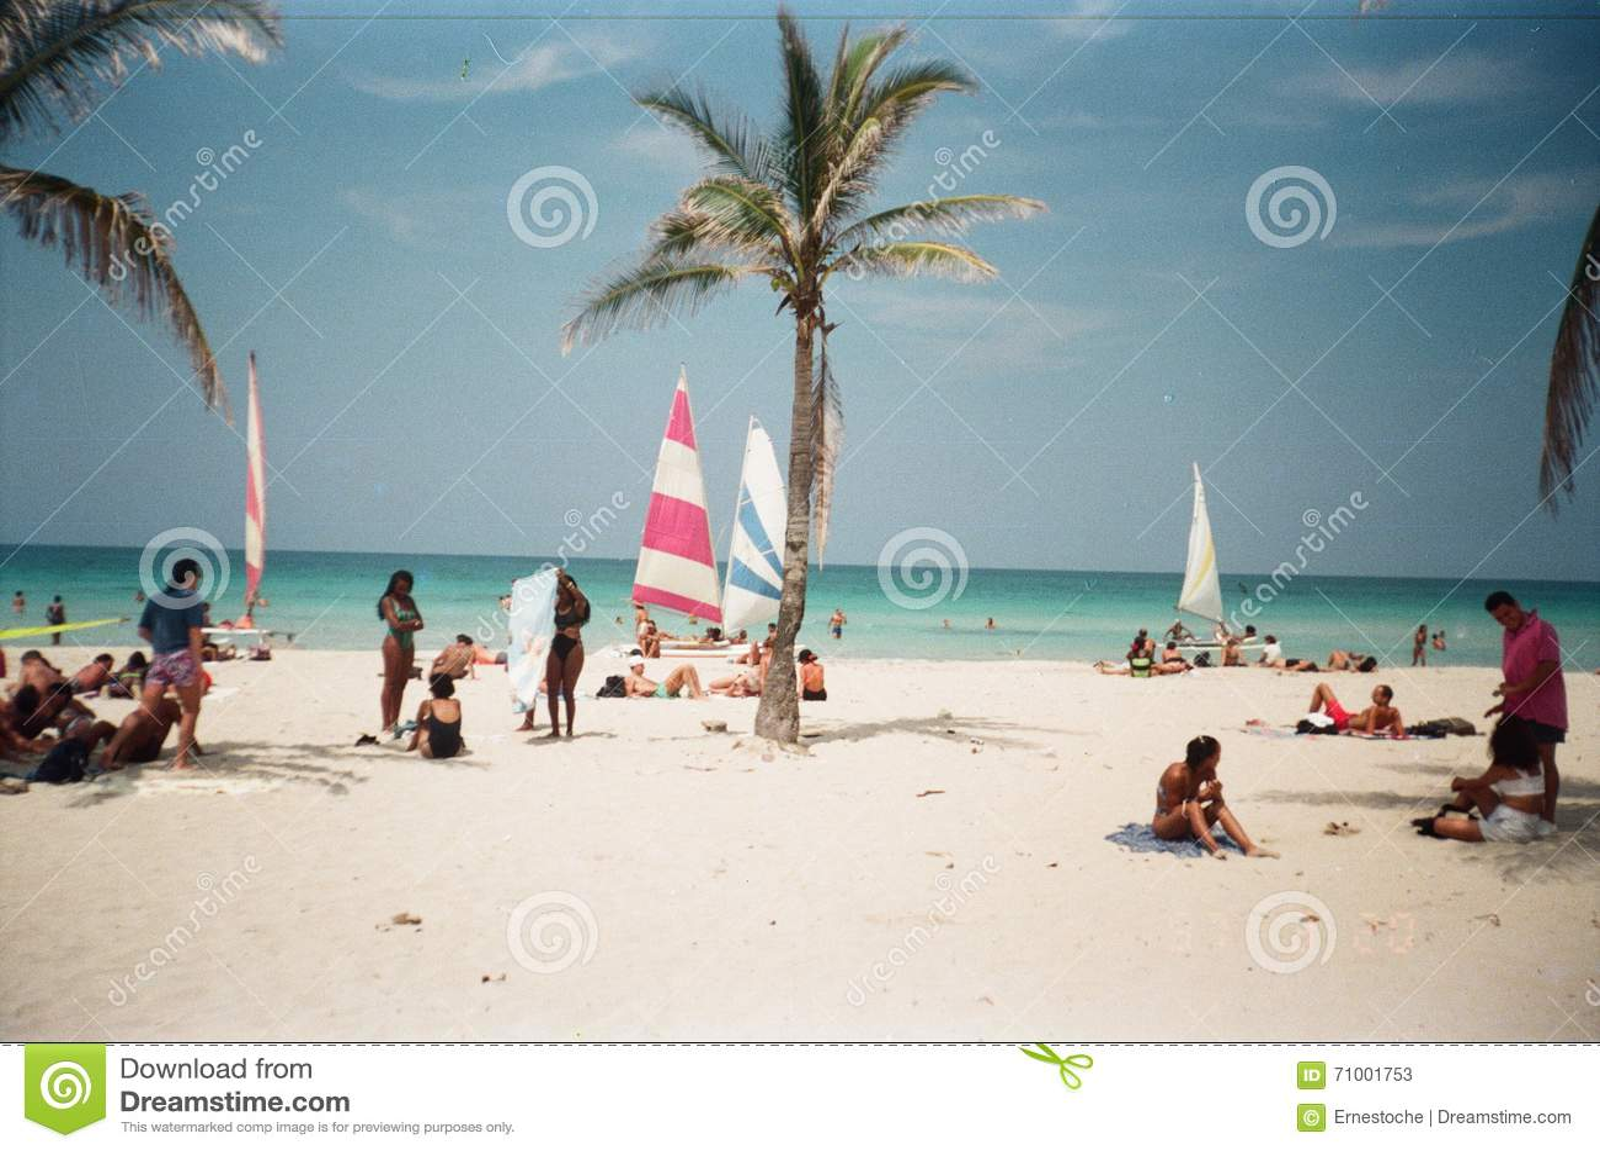 Playa de Guanabo en La Habana/Cuba